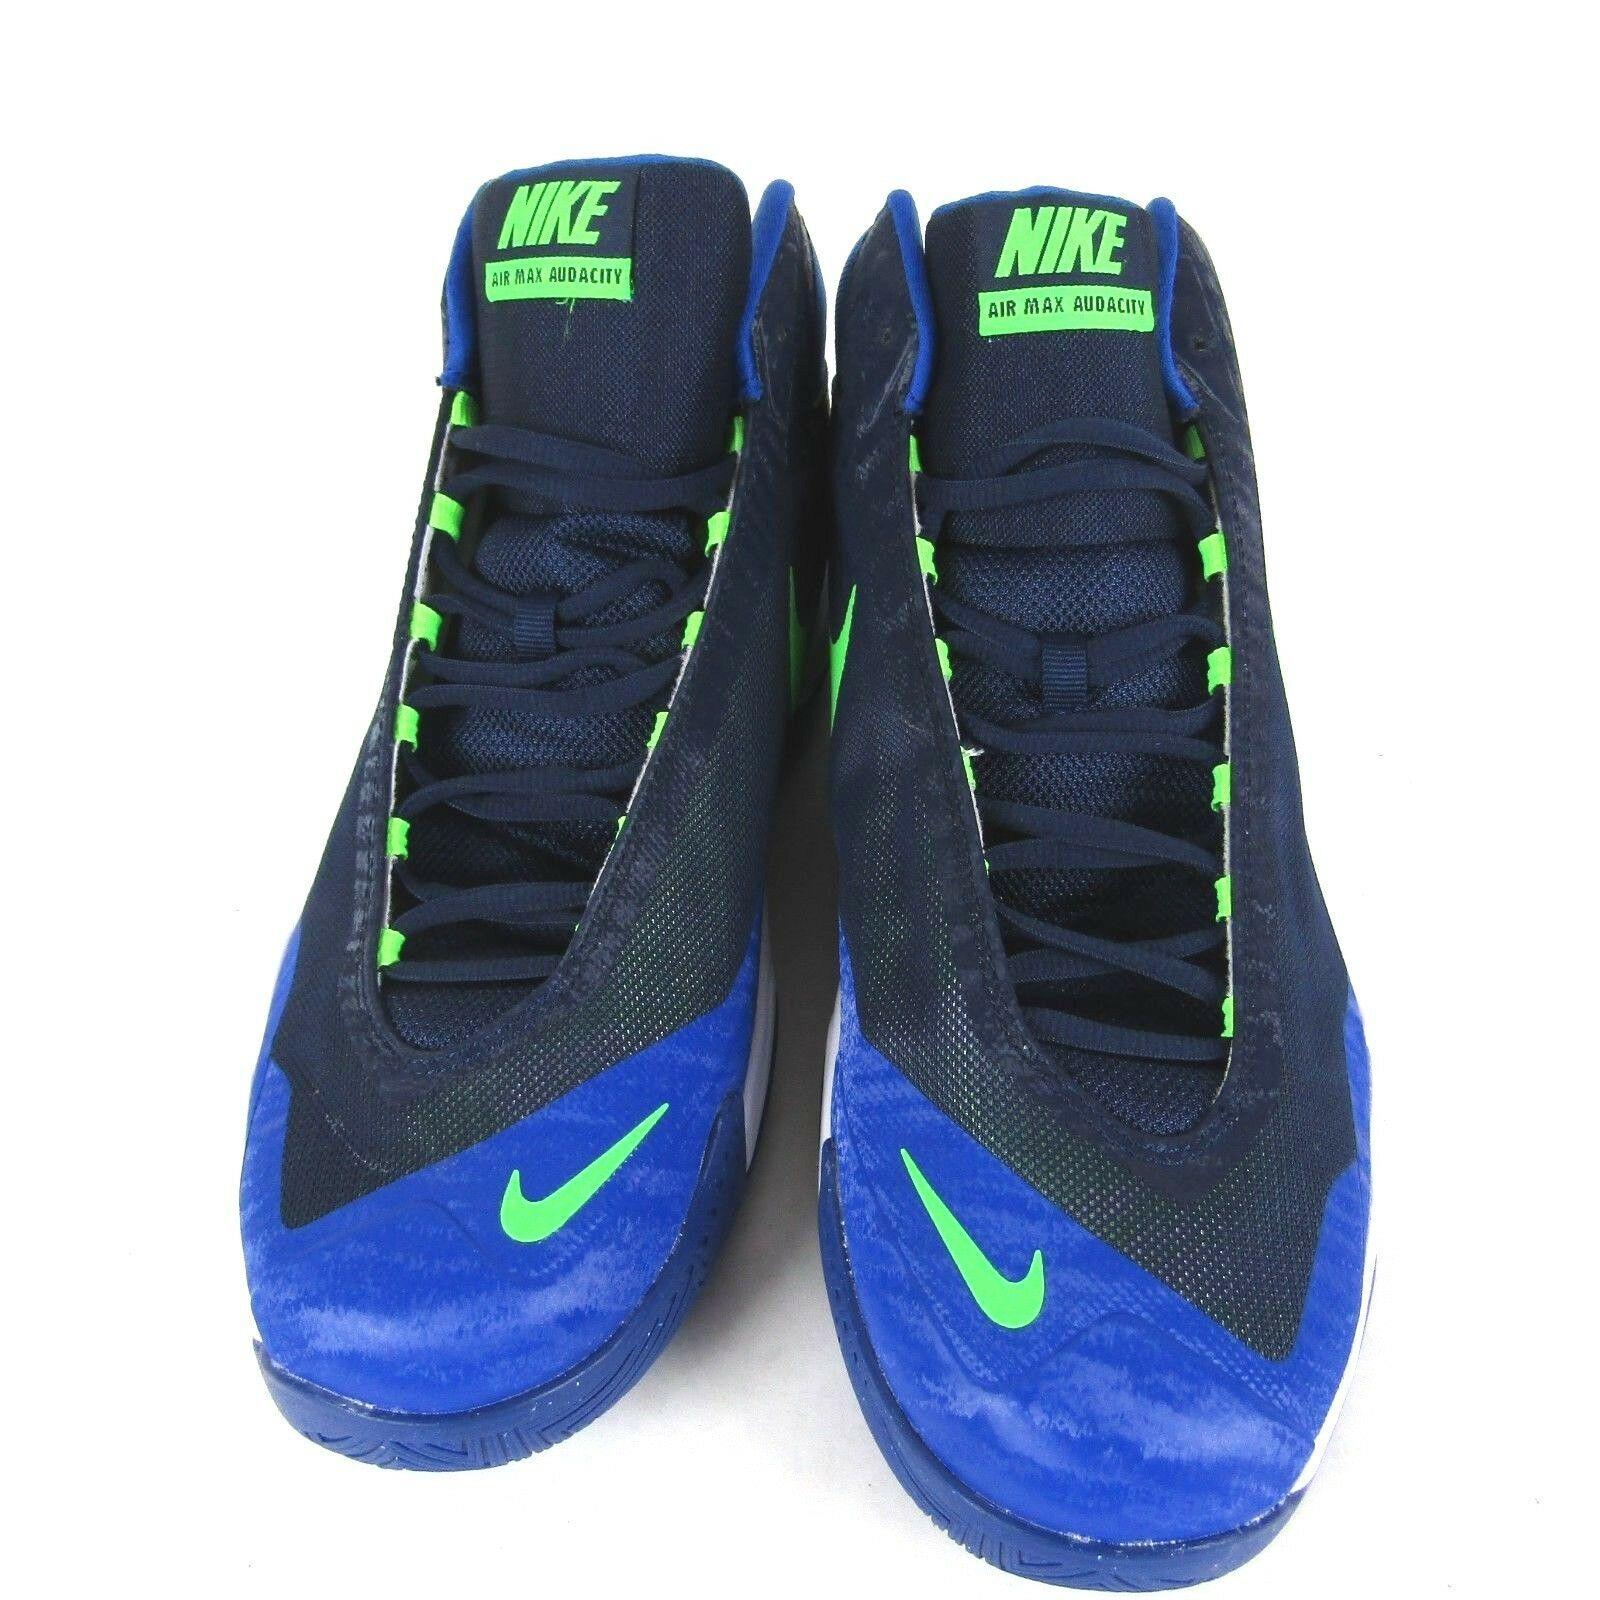 NEW Nike Air Max Audacity 704920 401 and 50 similar items